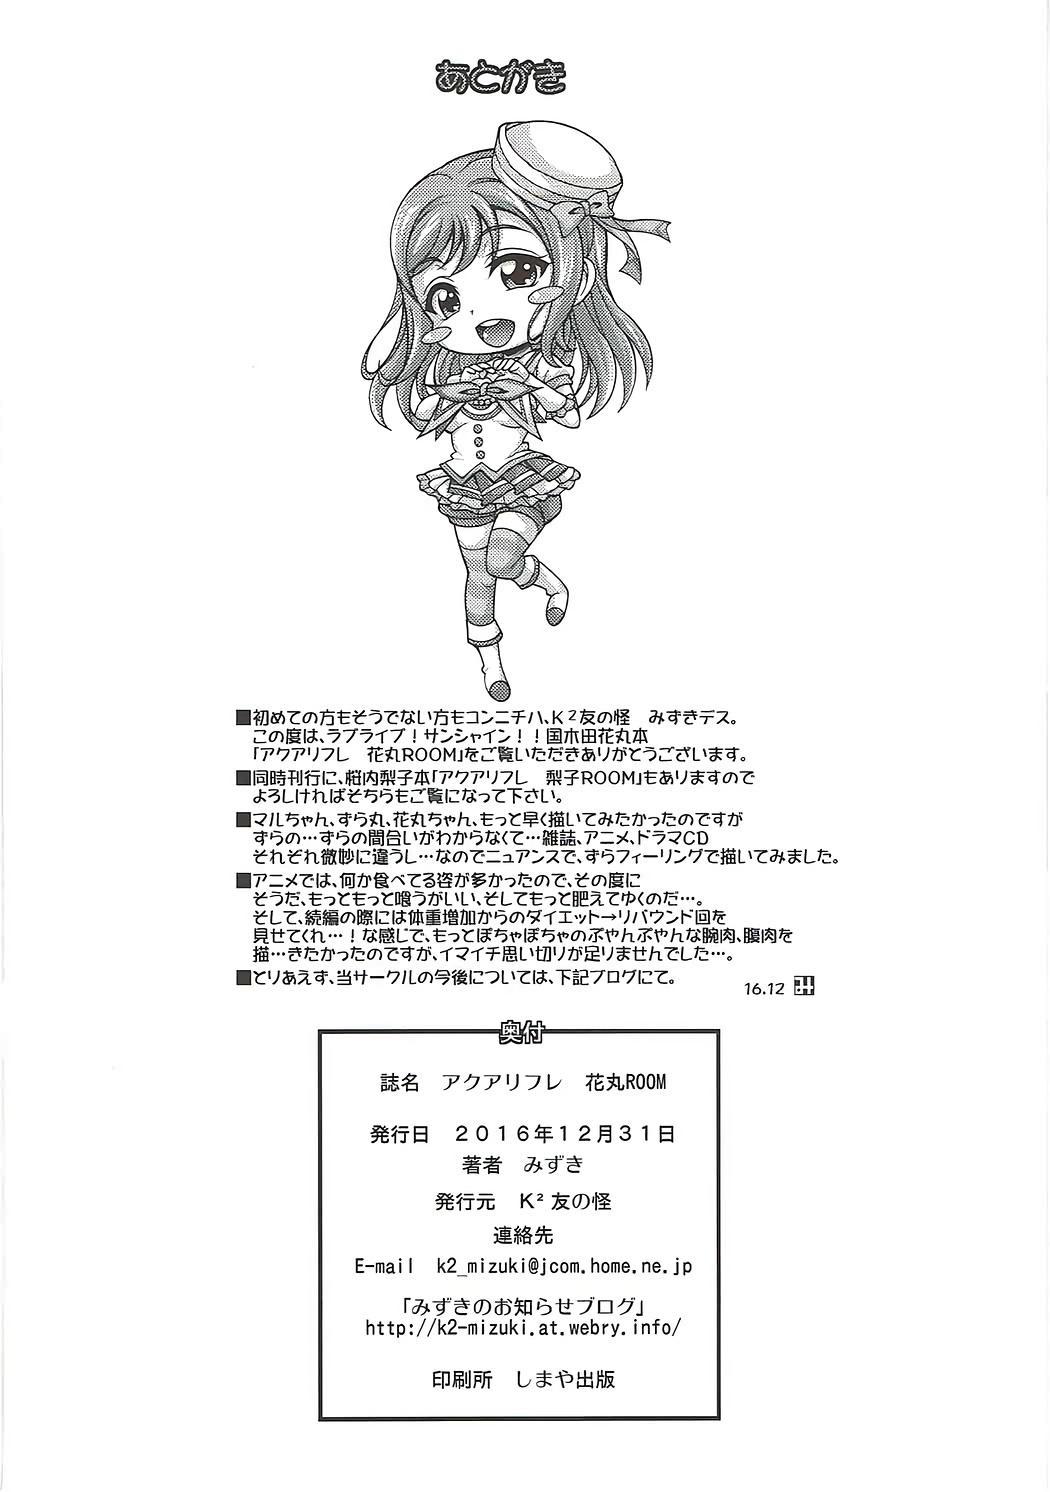 Aqours Refle Hanamaru ROOM 20